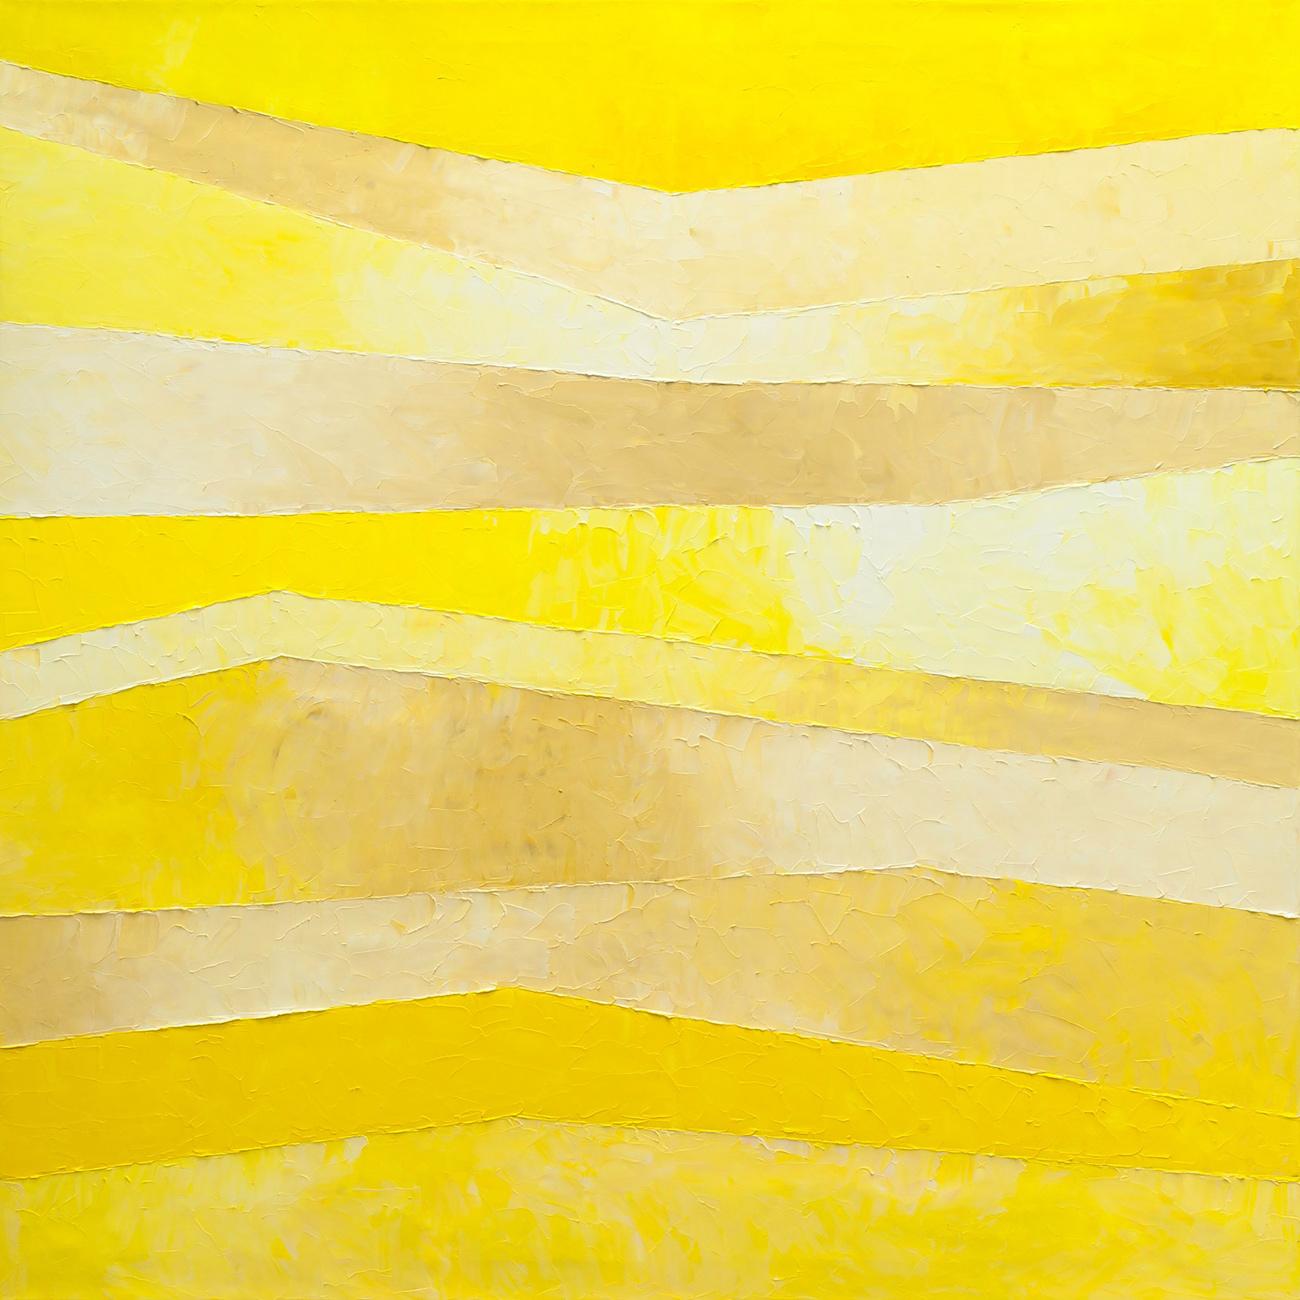 Lines-yellow